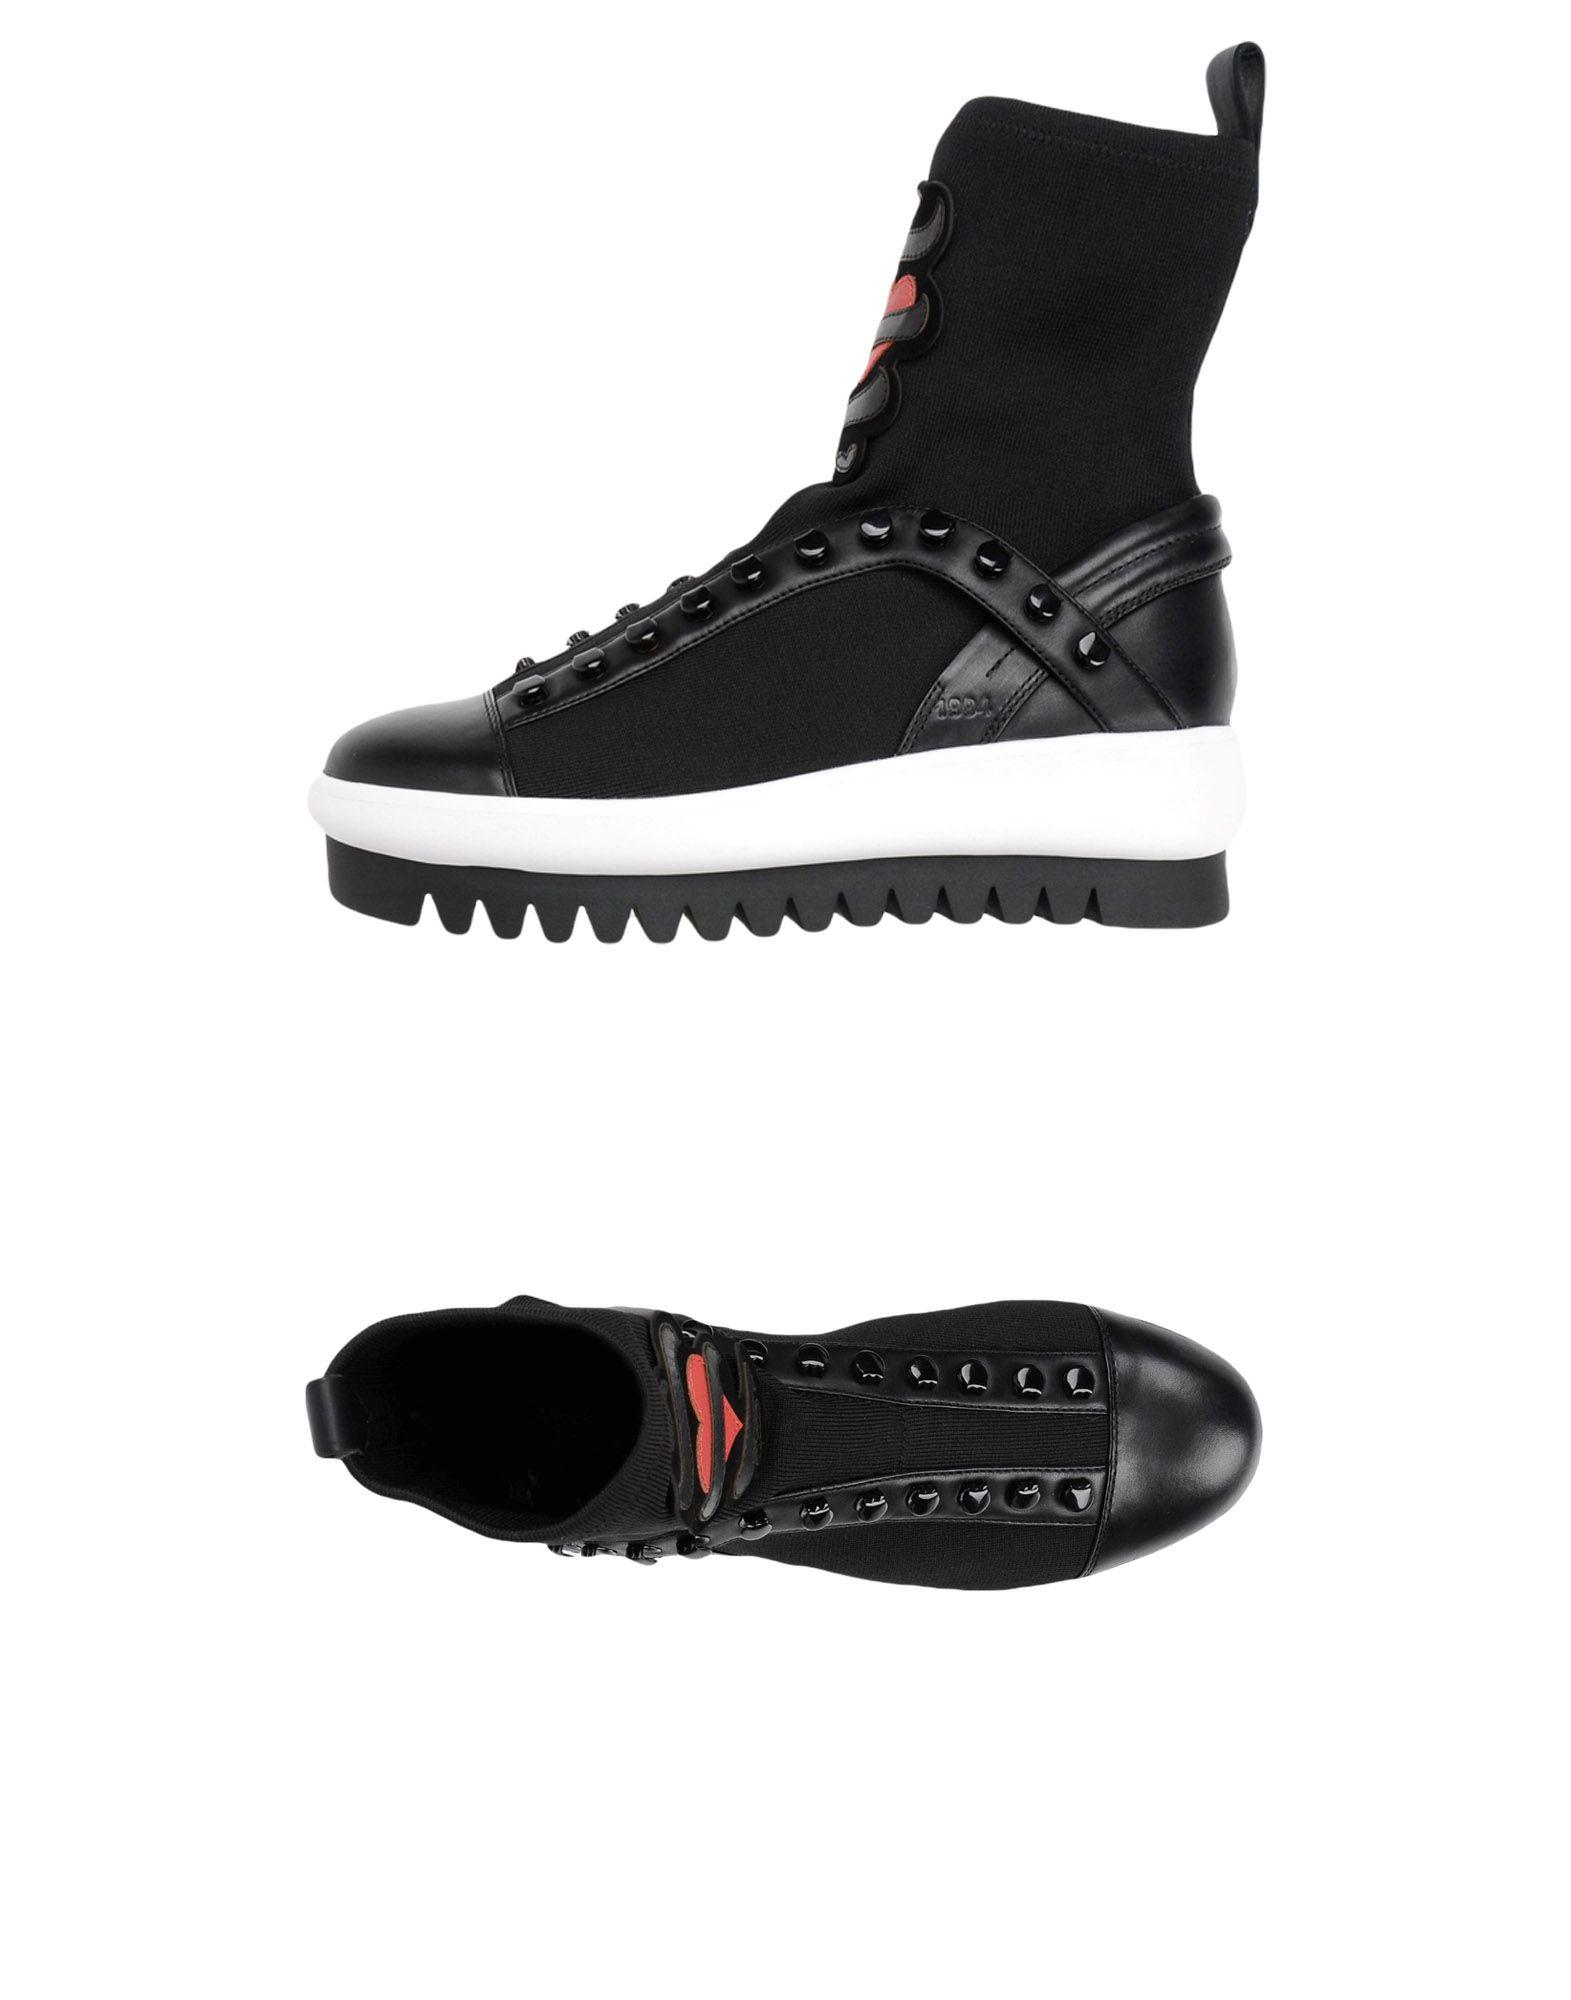 Sneakers Clone Rocmoon - Donna - Acquista online su